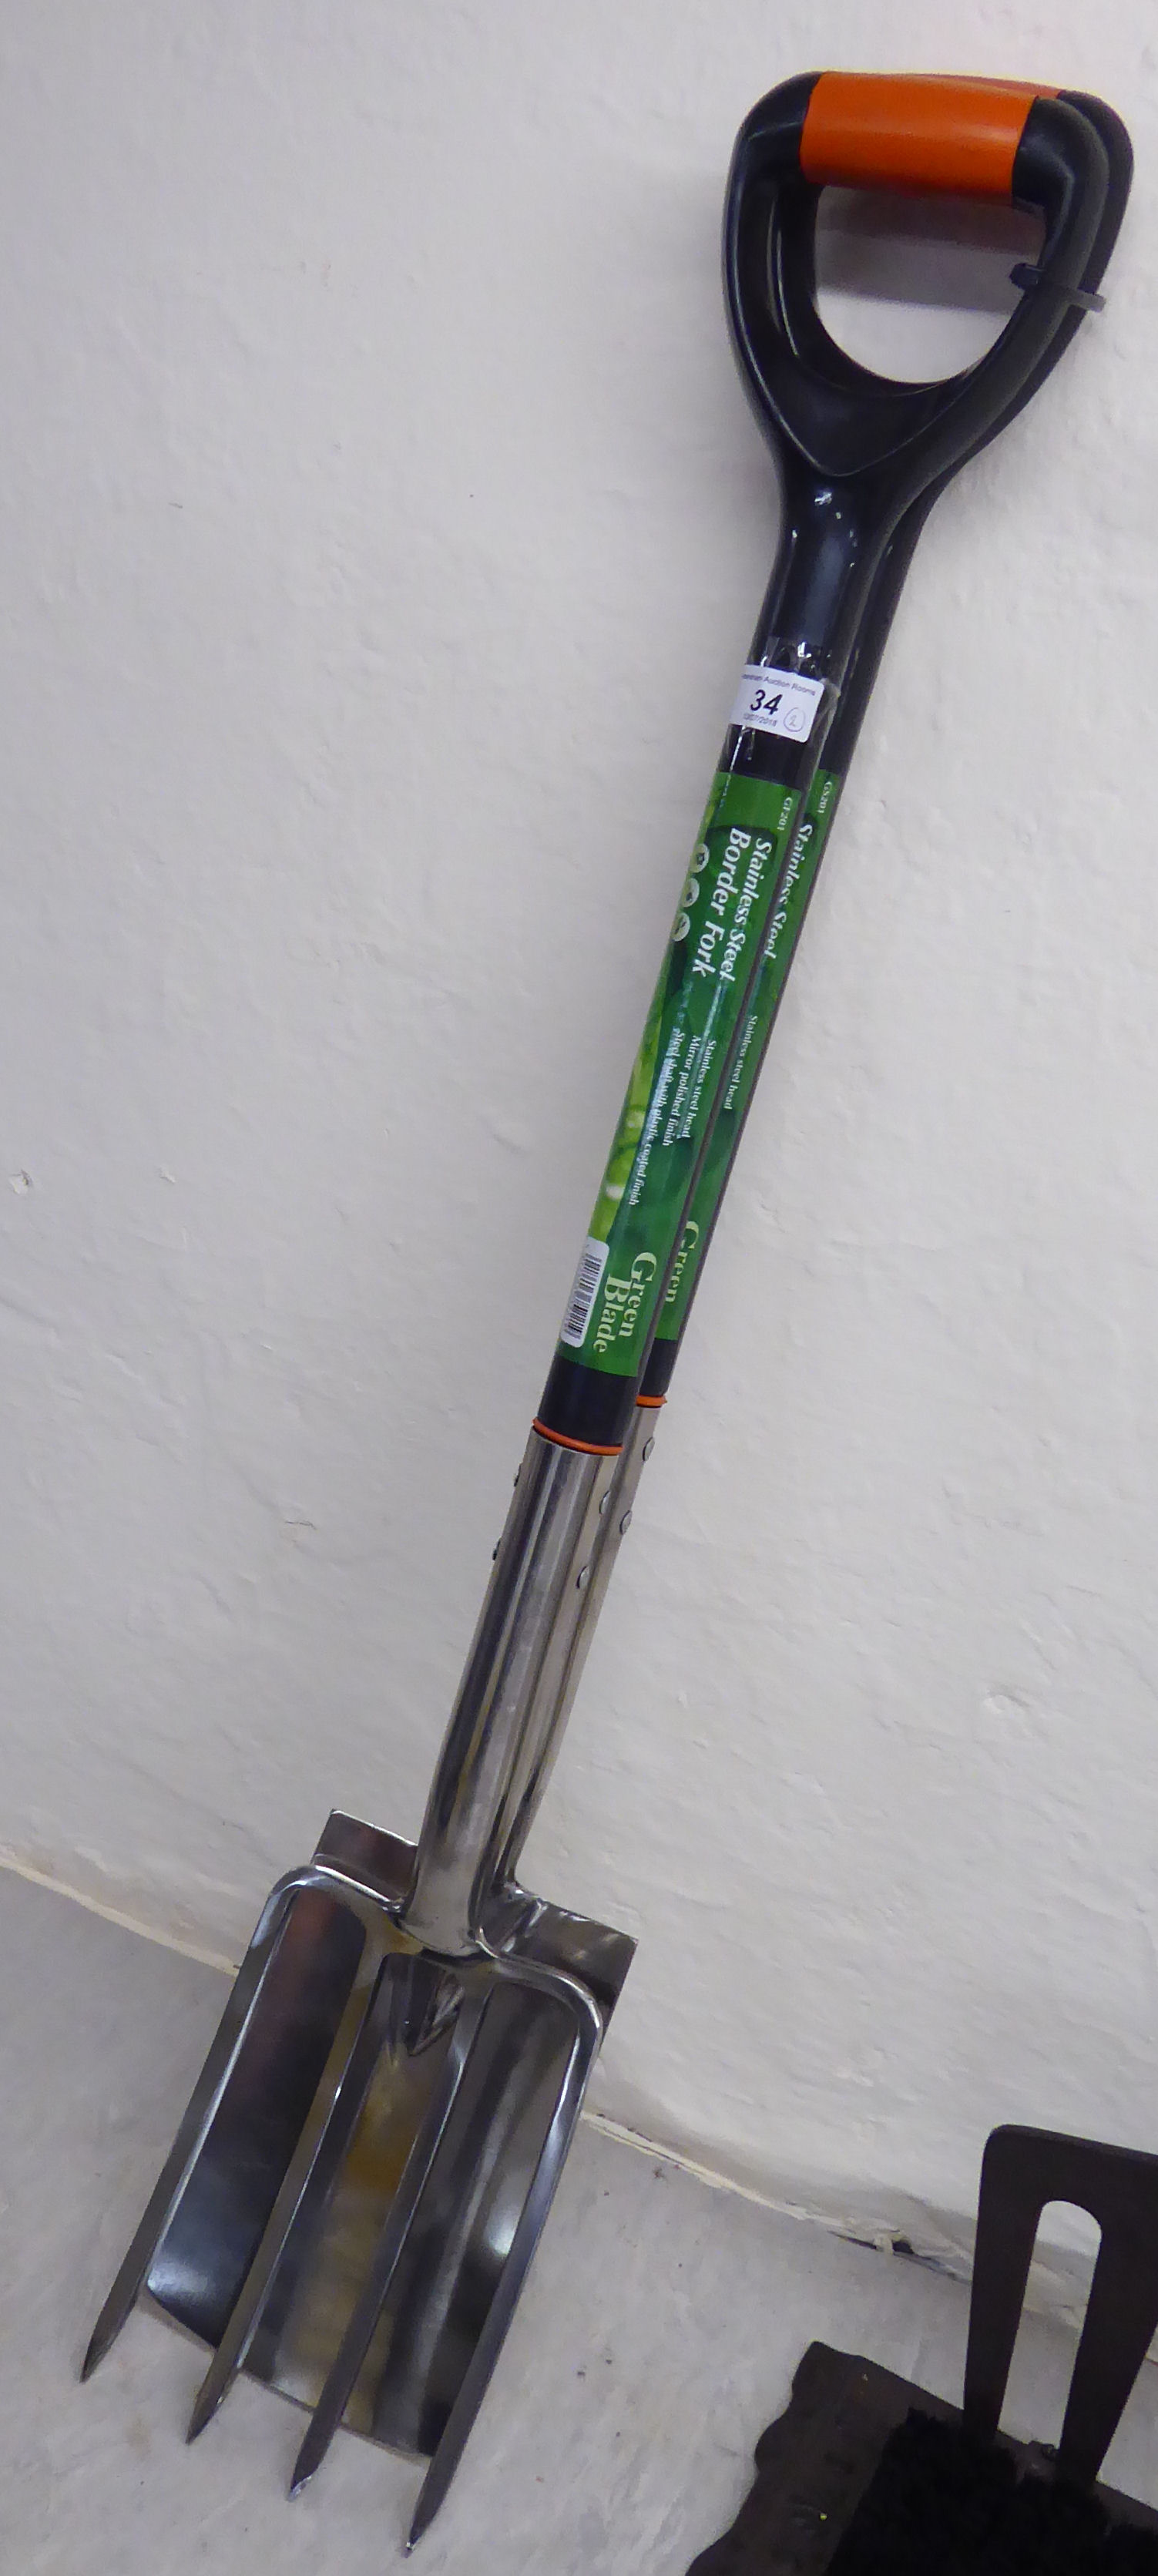 Lot 34 - A Green Blade stainless steel garden fork and spade BSR